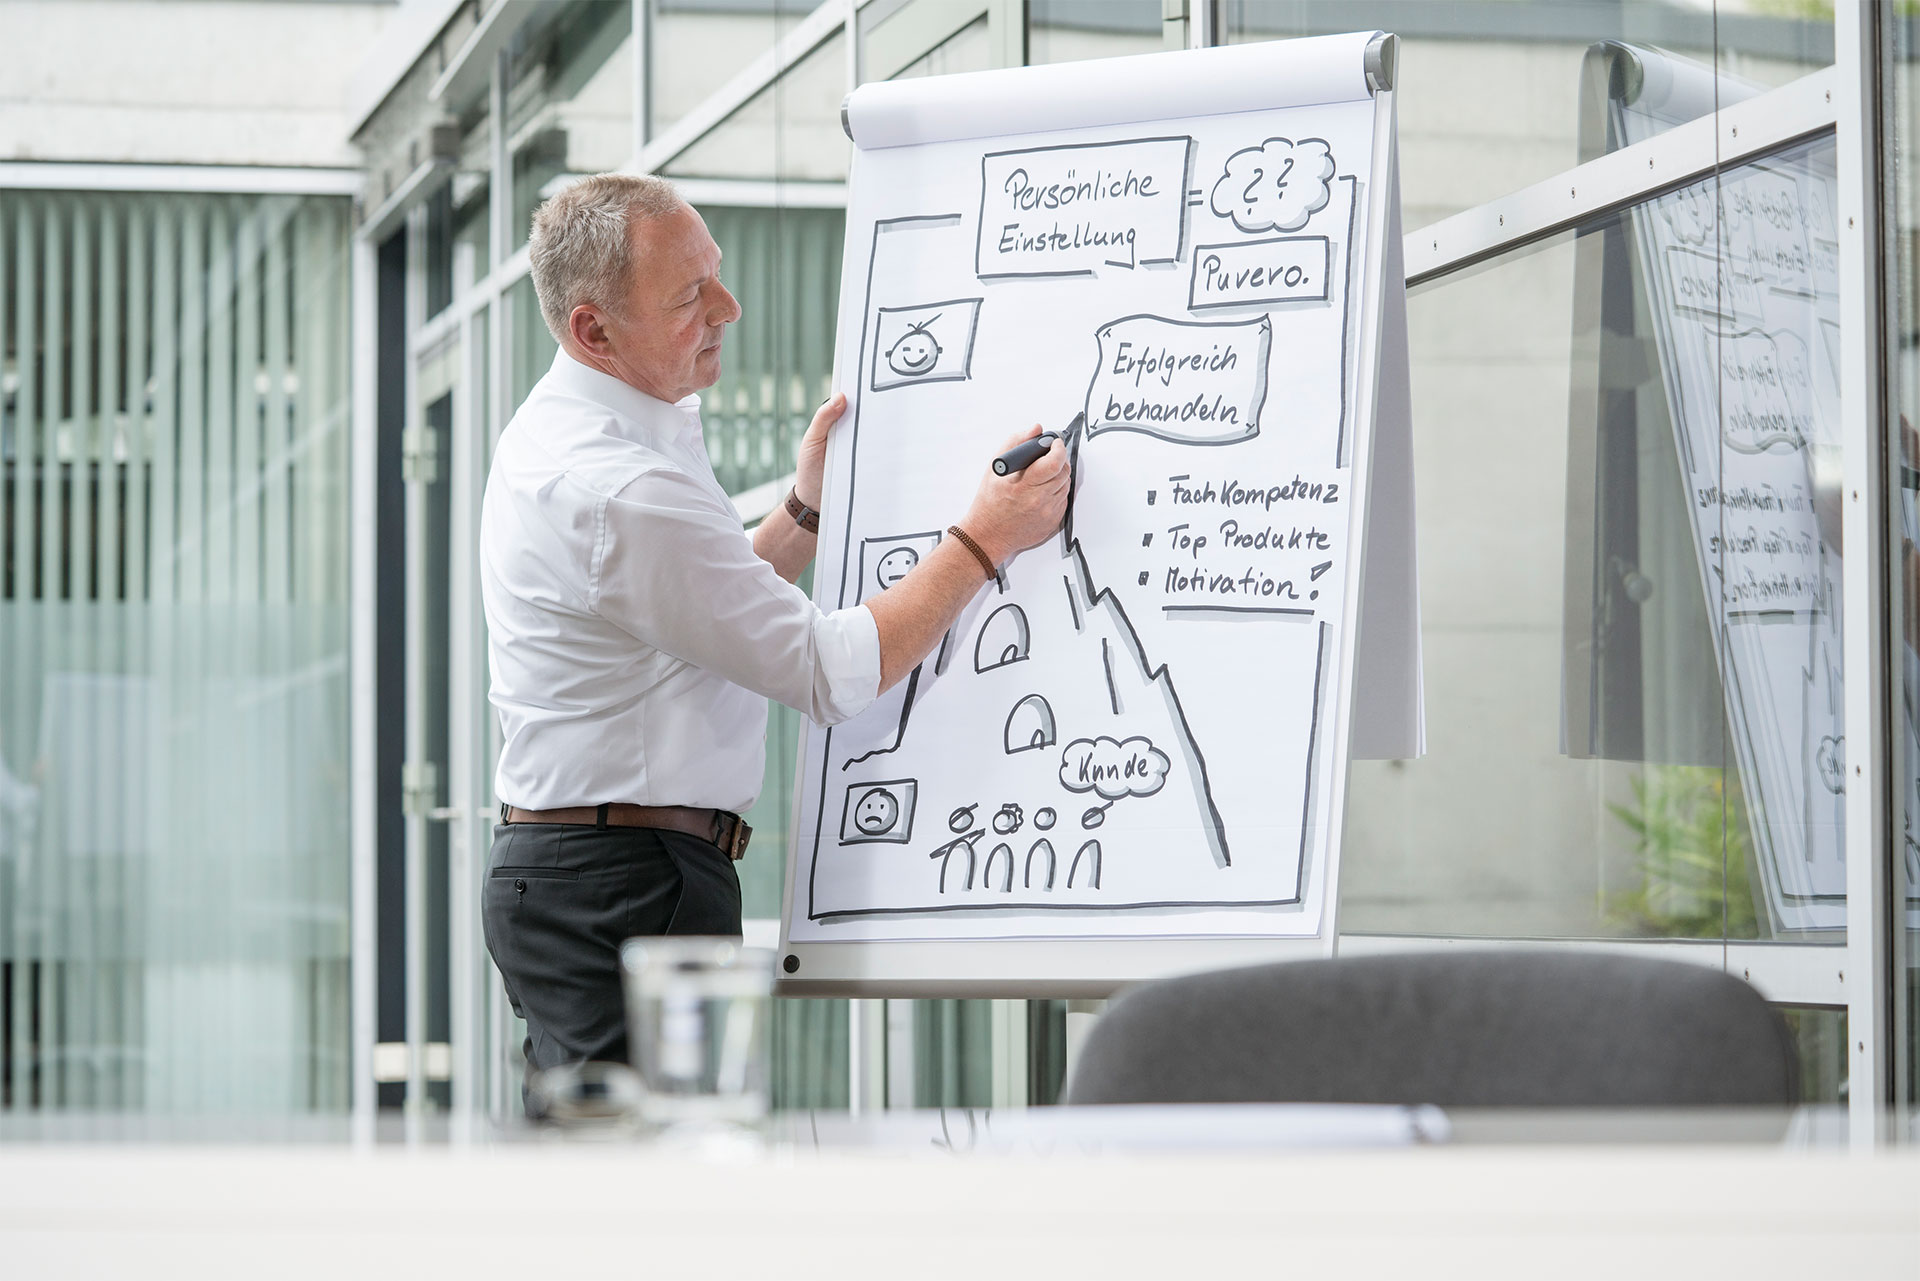 Joachim Steinke bei Inhouse Training am White Board